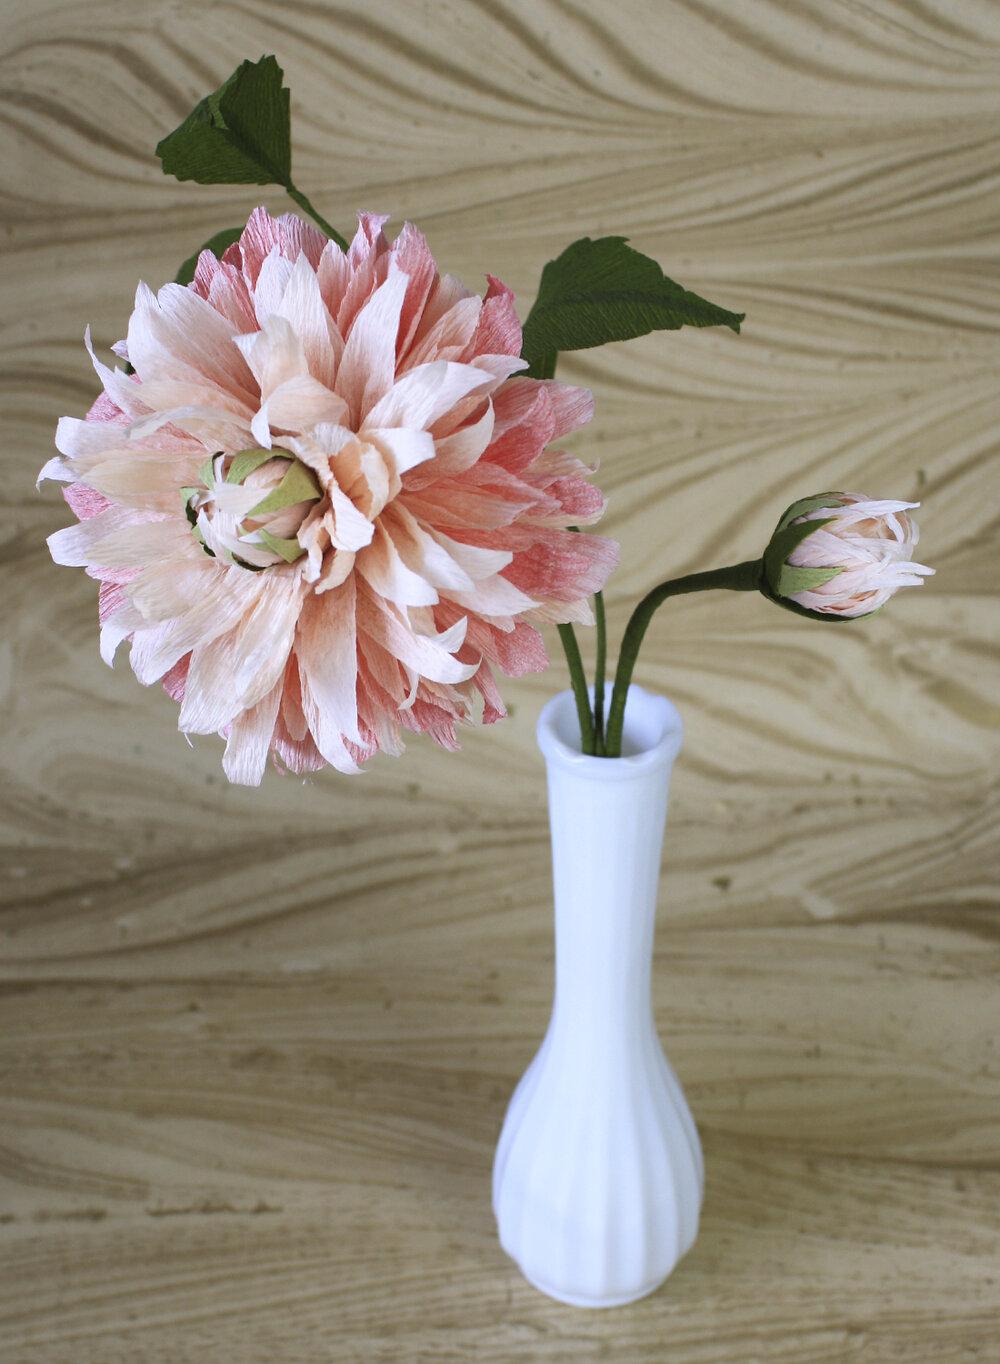 Dahlia Crepe Paper Flower Papercraft Miracles Llc